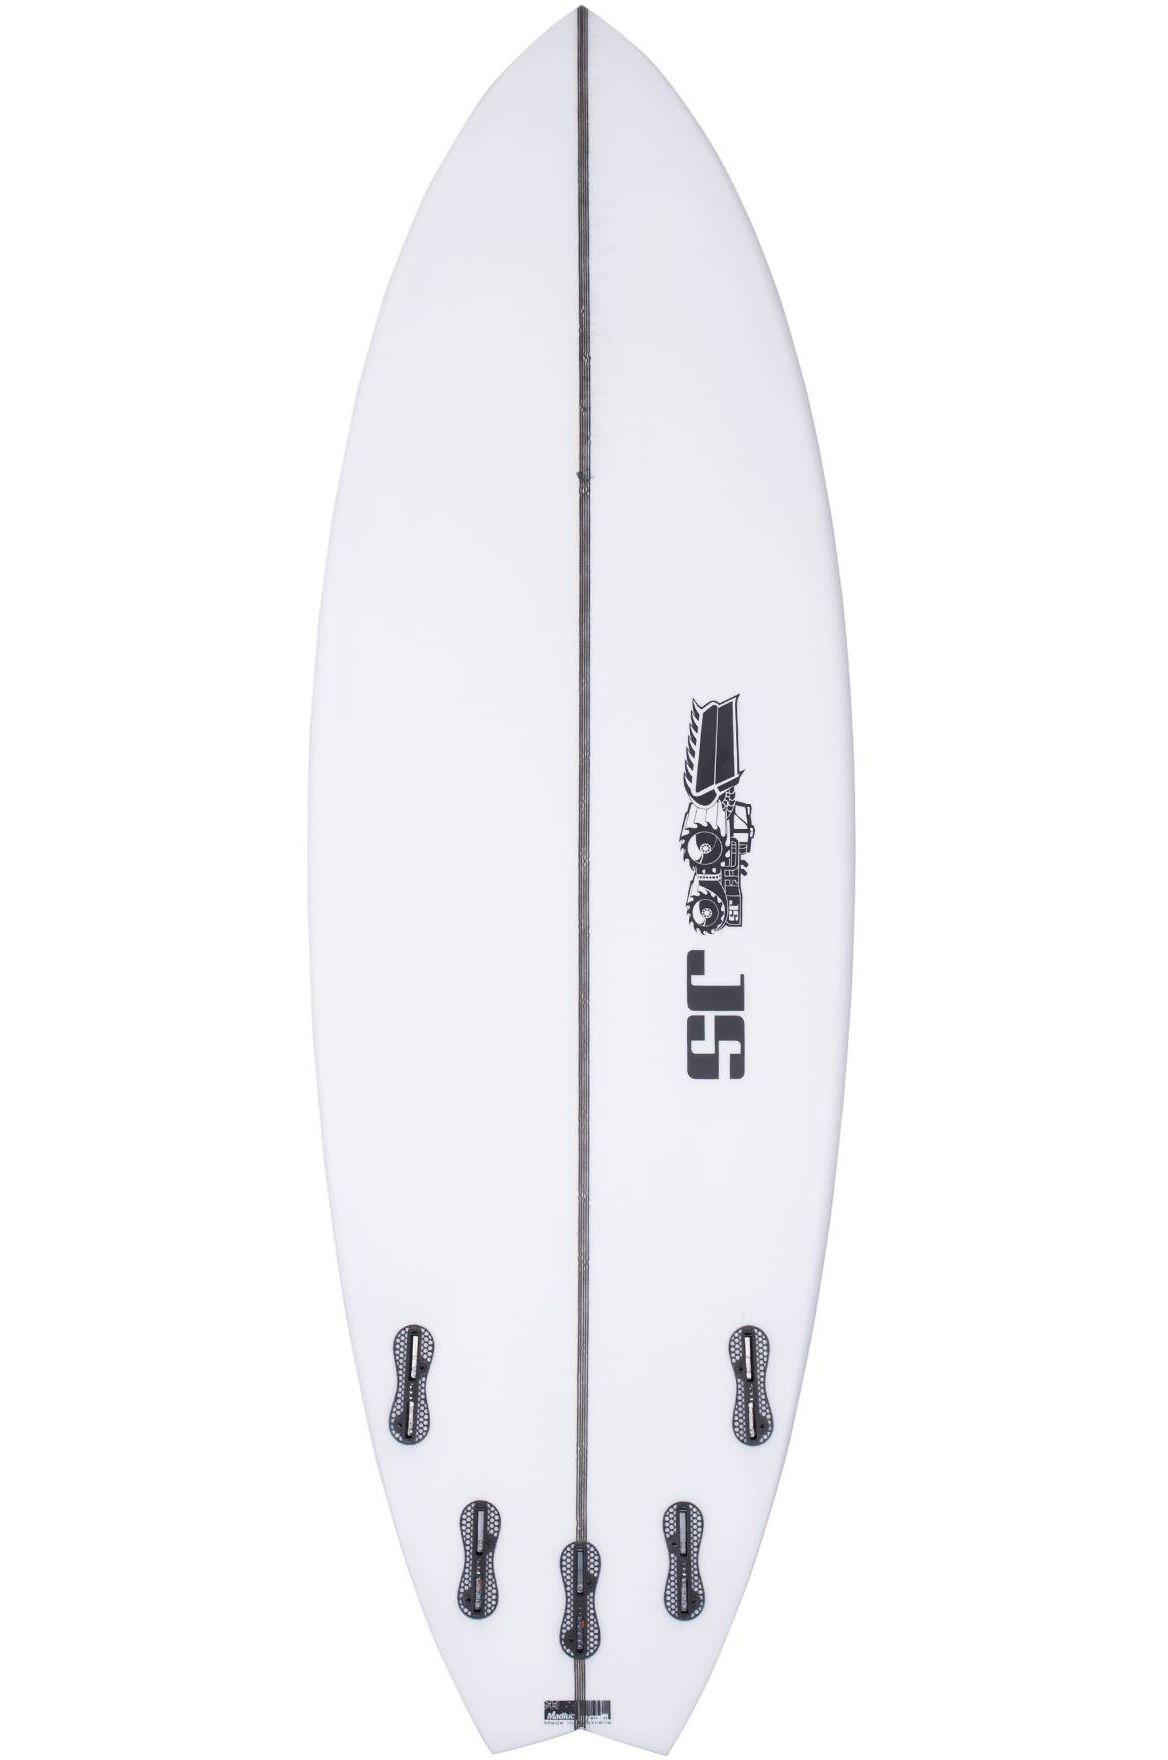 Prancha Surf JS PSYCHO NITRO 5'6 Swallow Tail - White FCS II Multisystem 5ft6